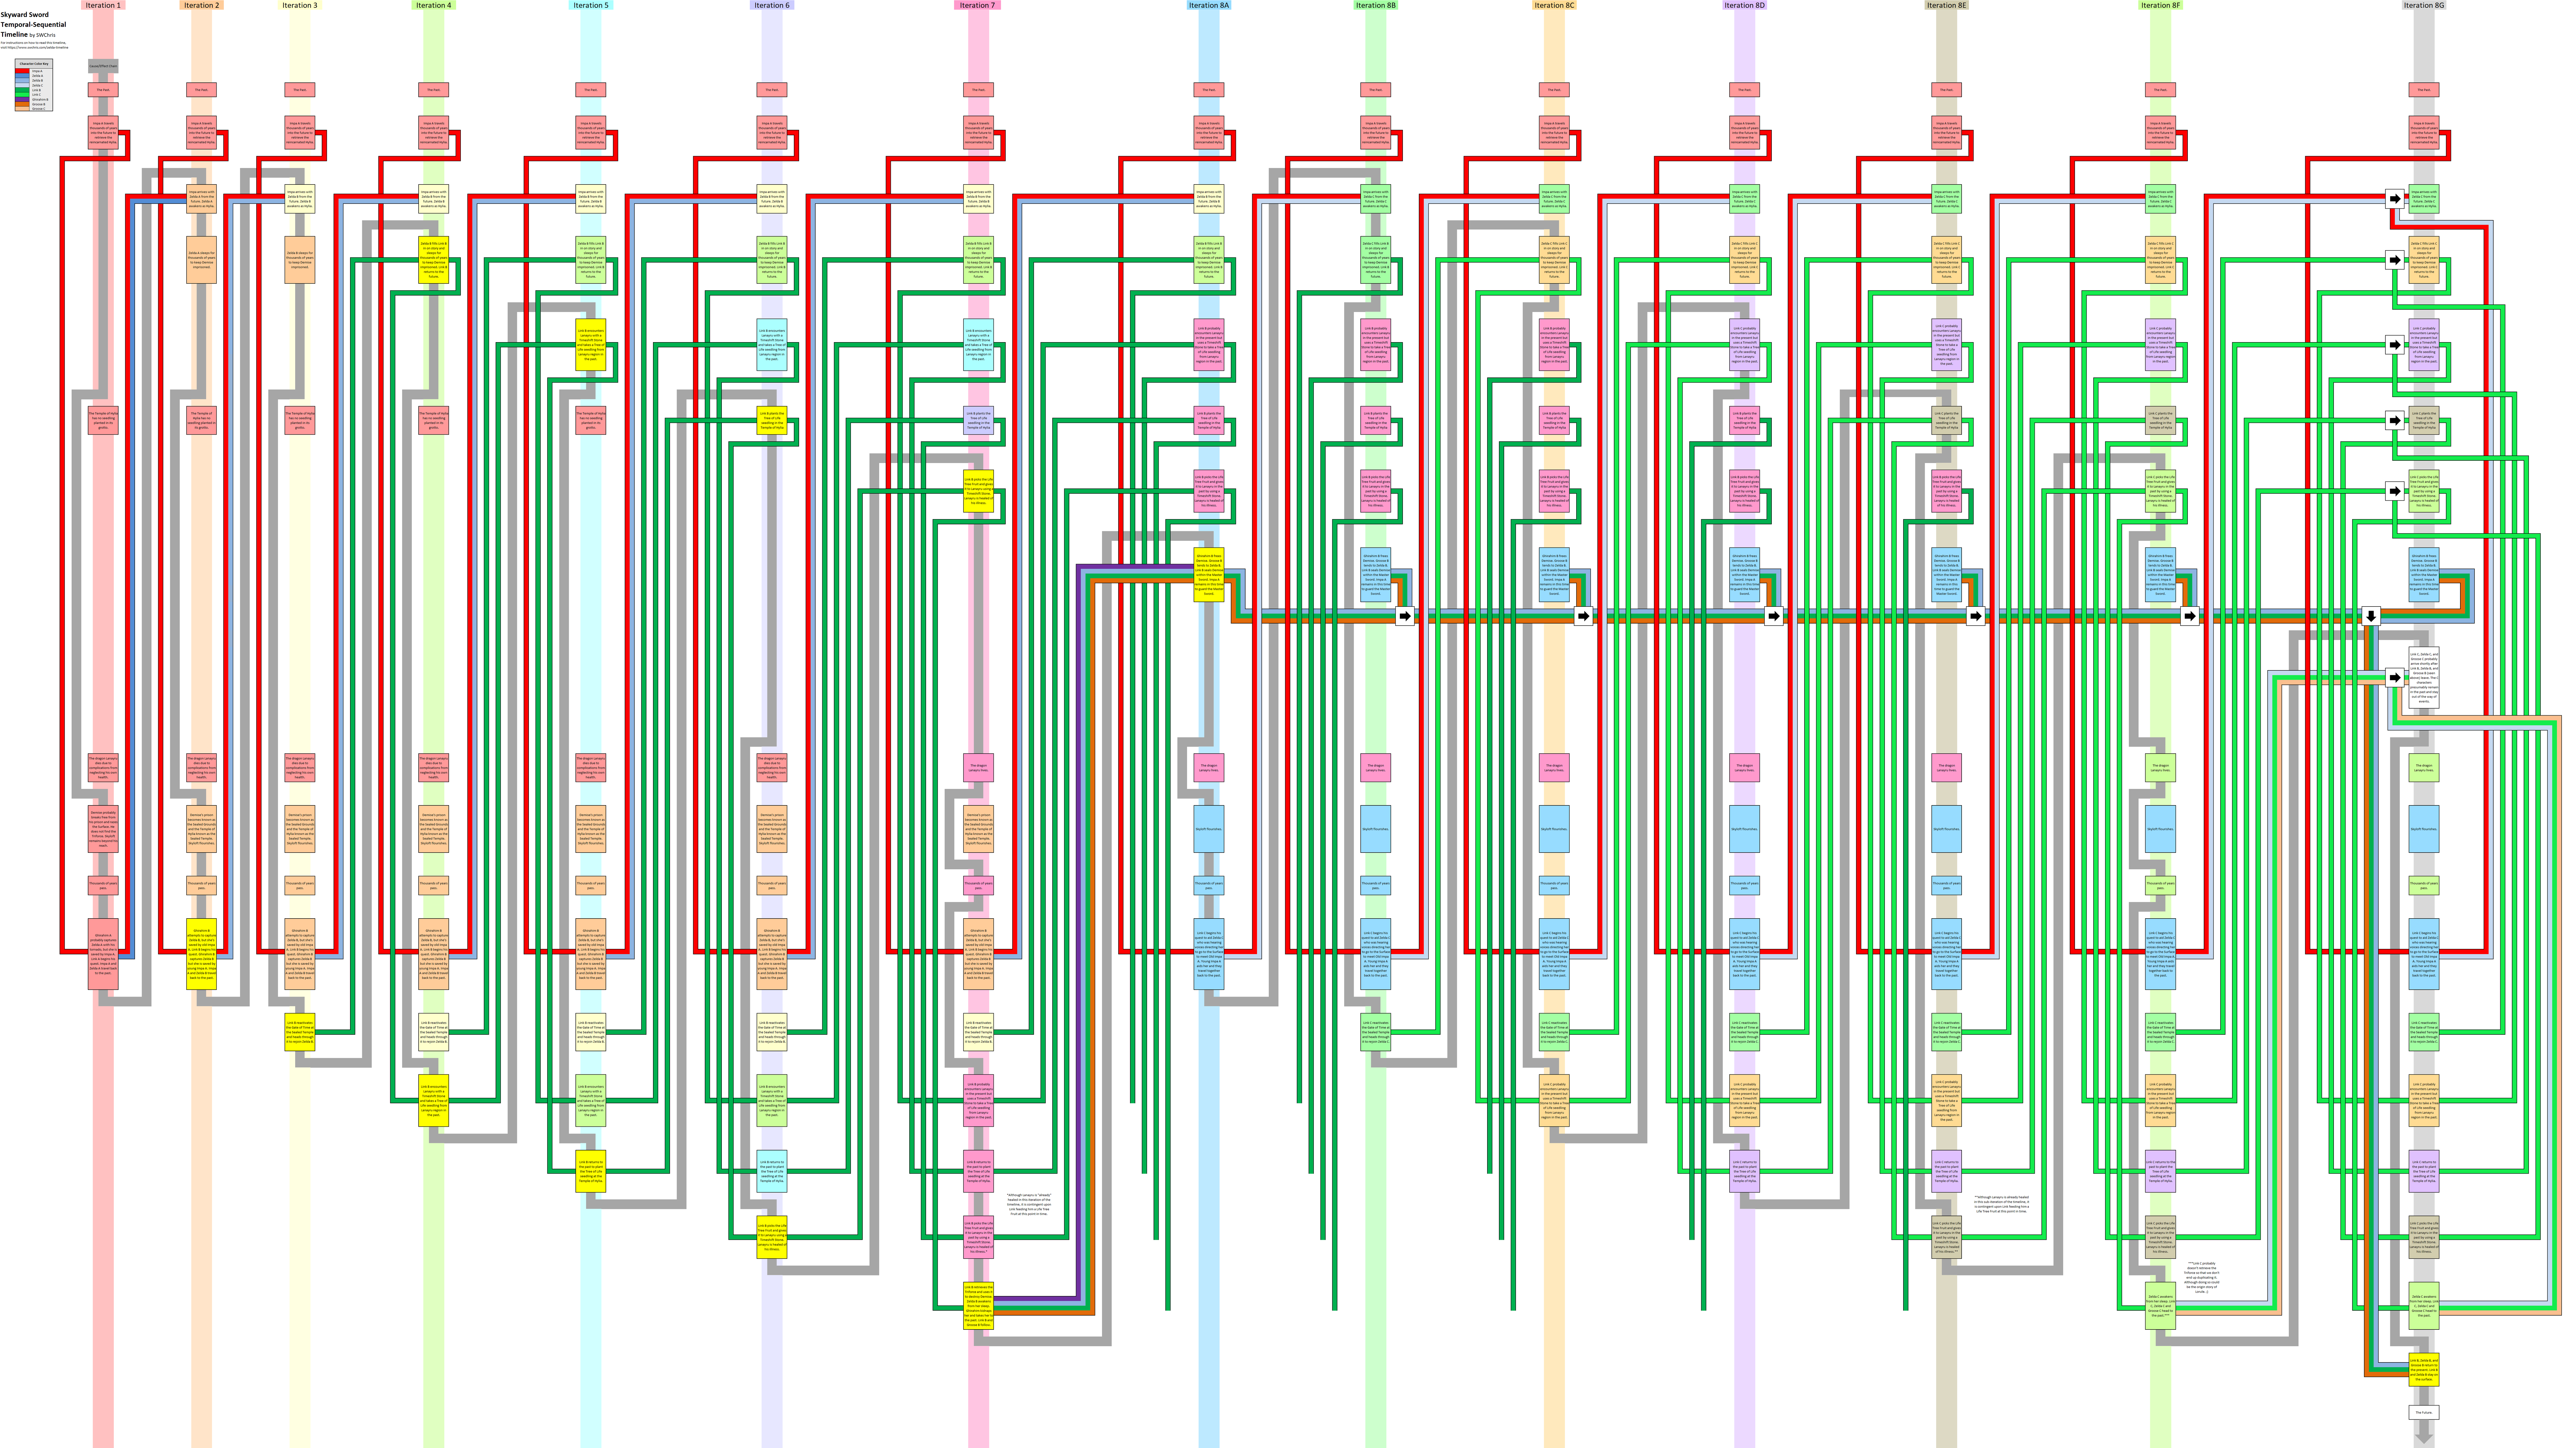 Skyward Sword Temporal Sequential Timeline